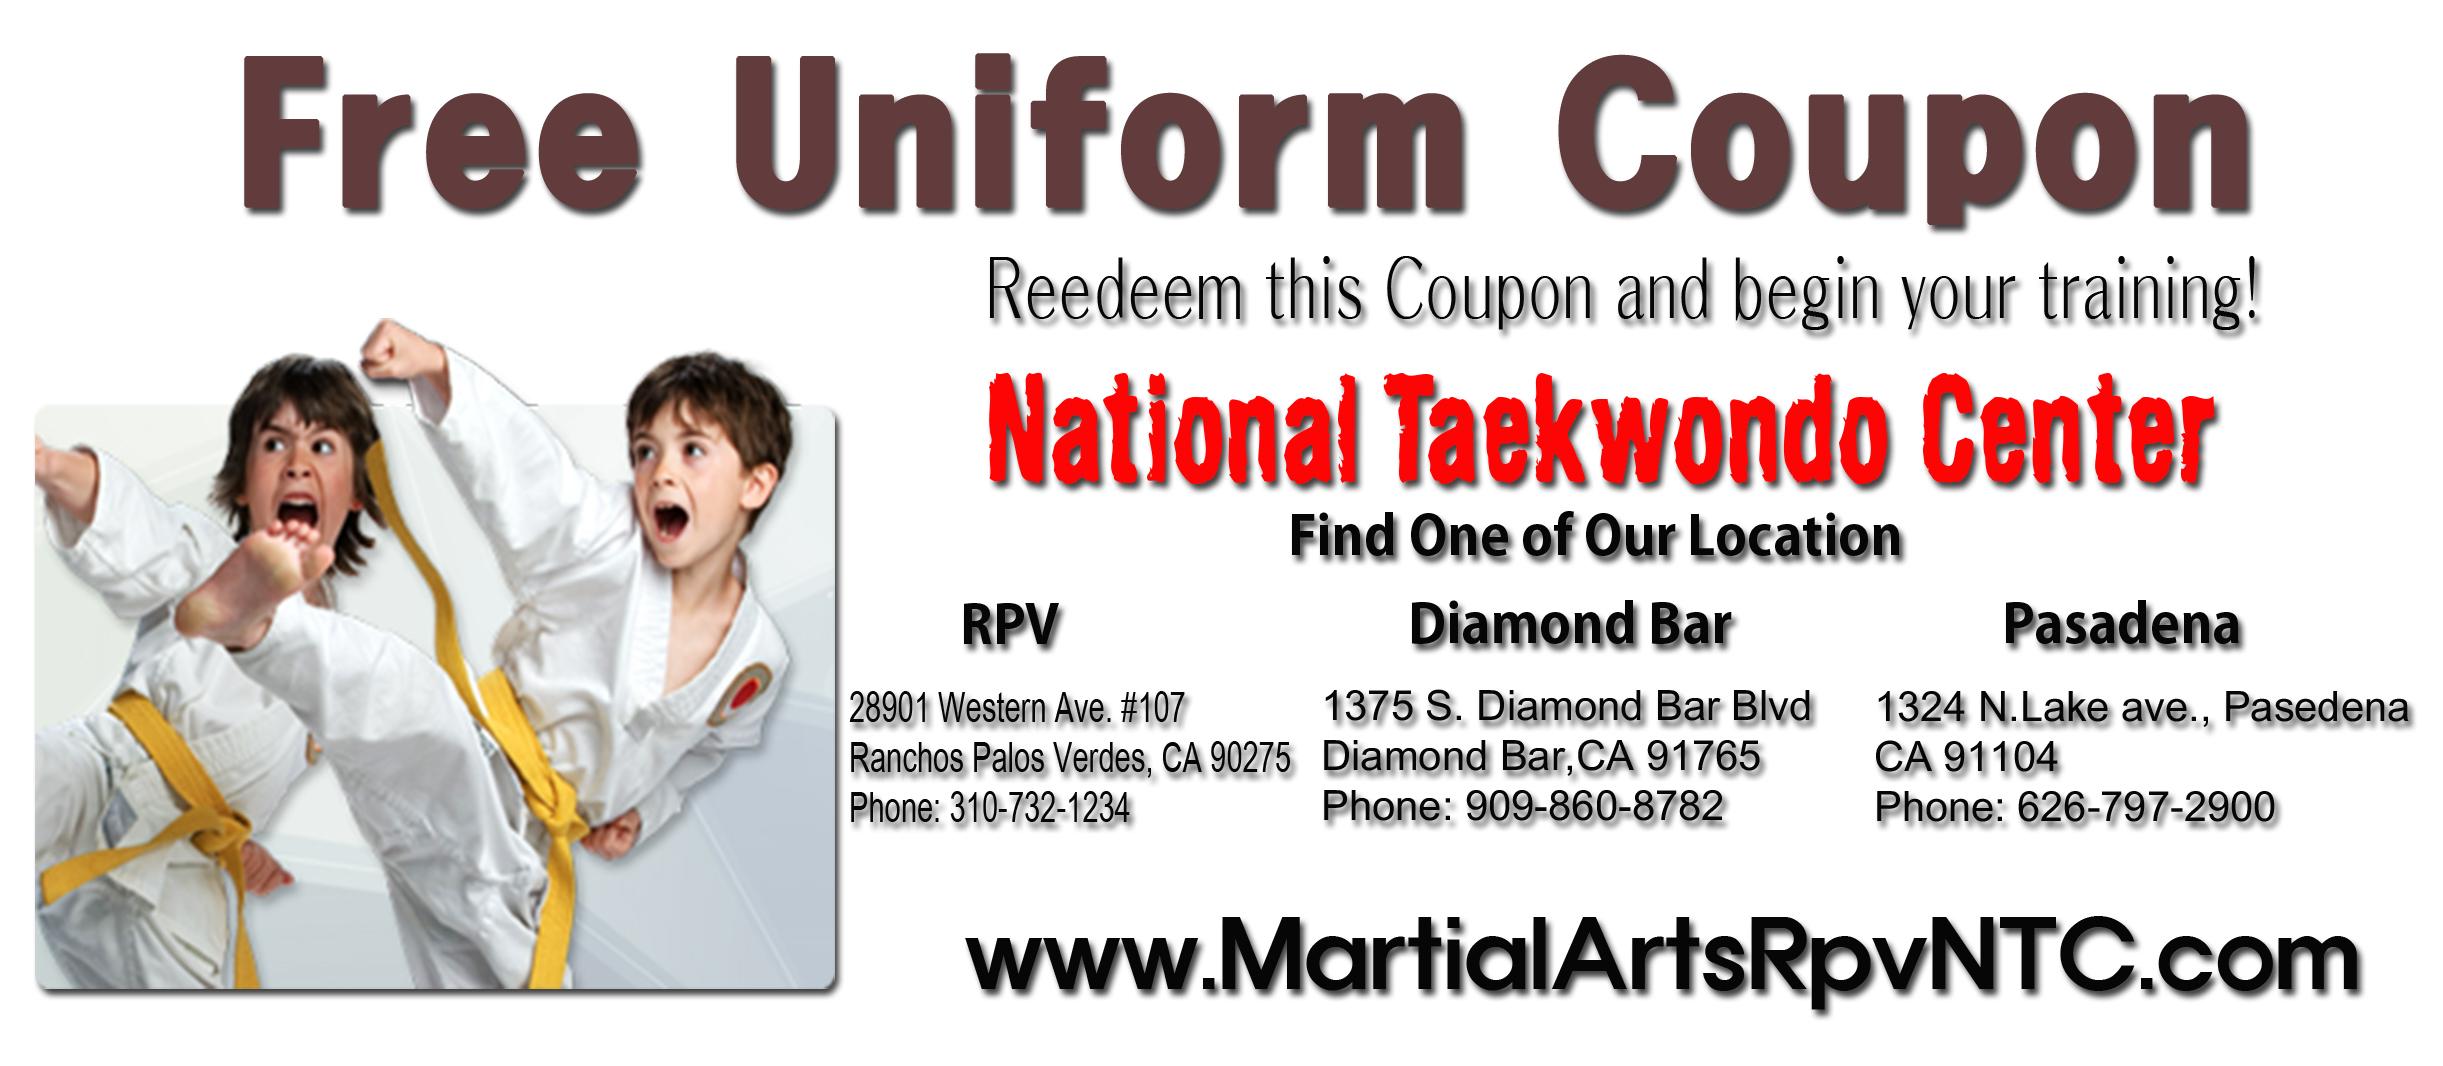 Free Uniform Coupon